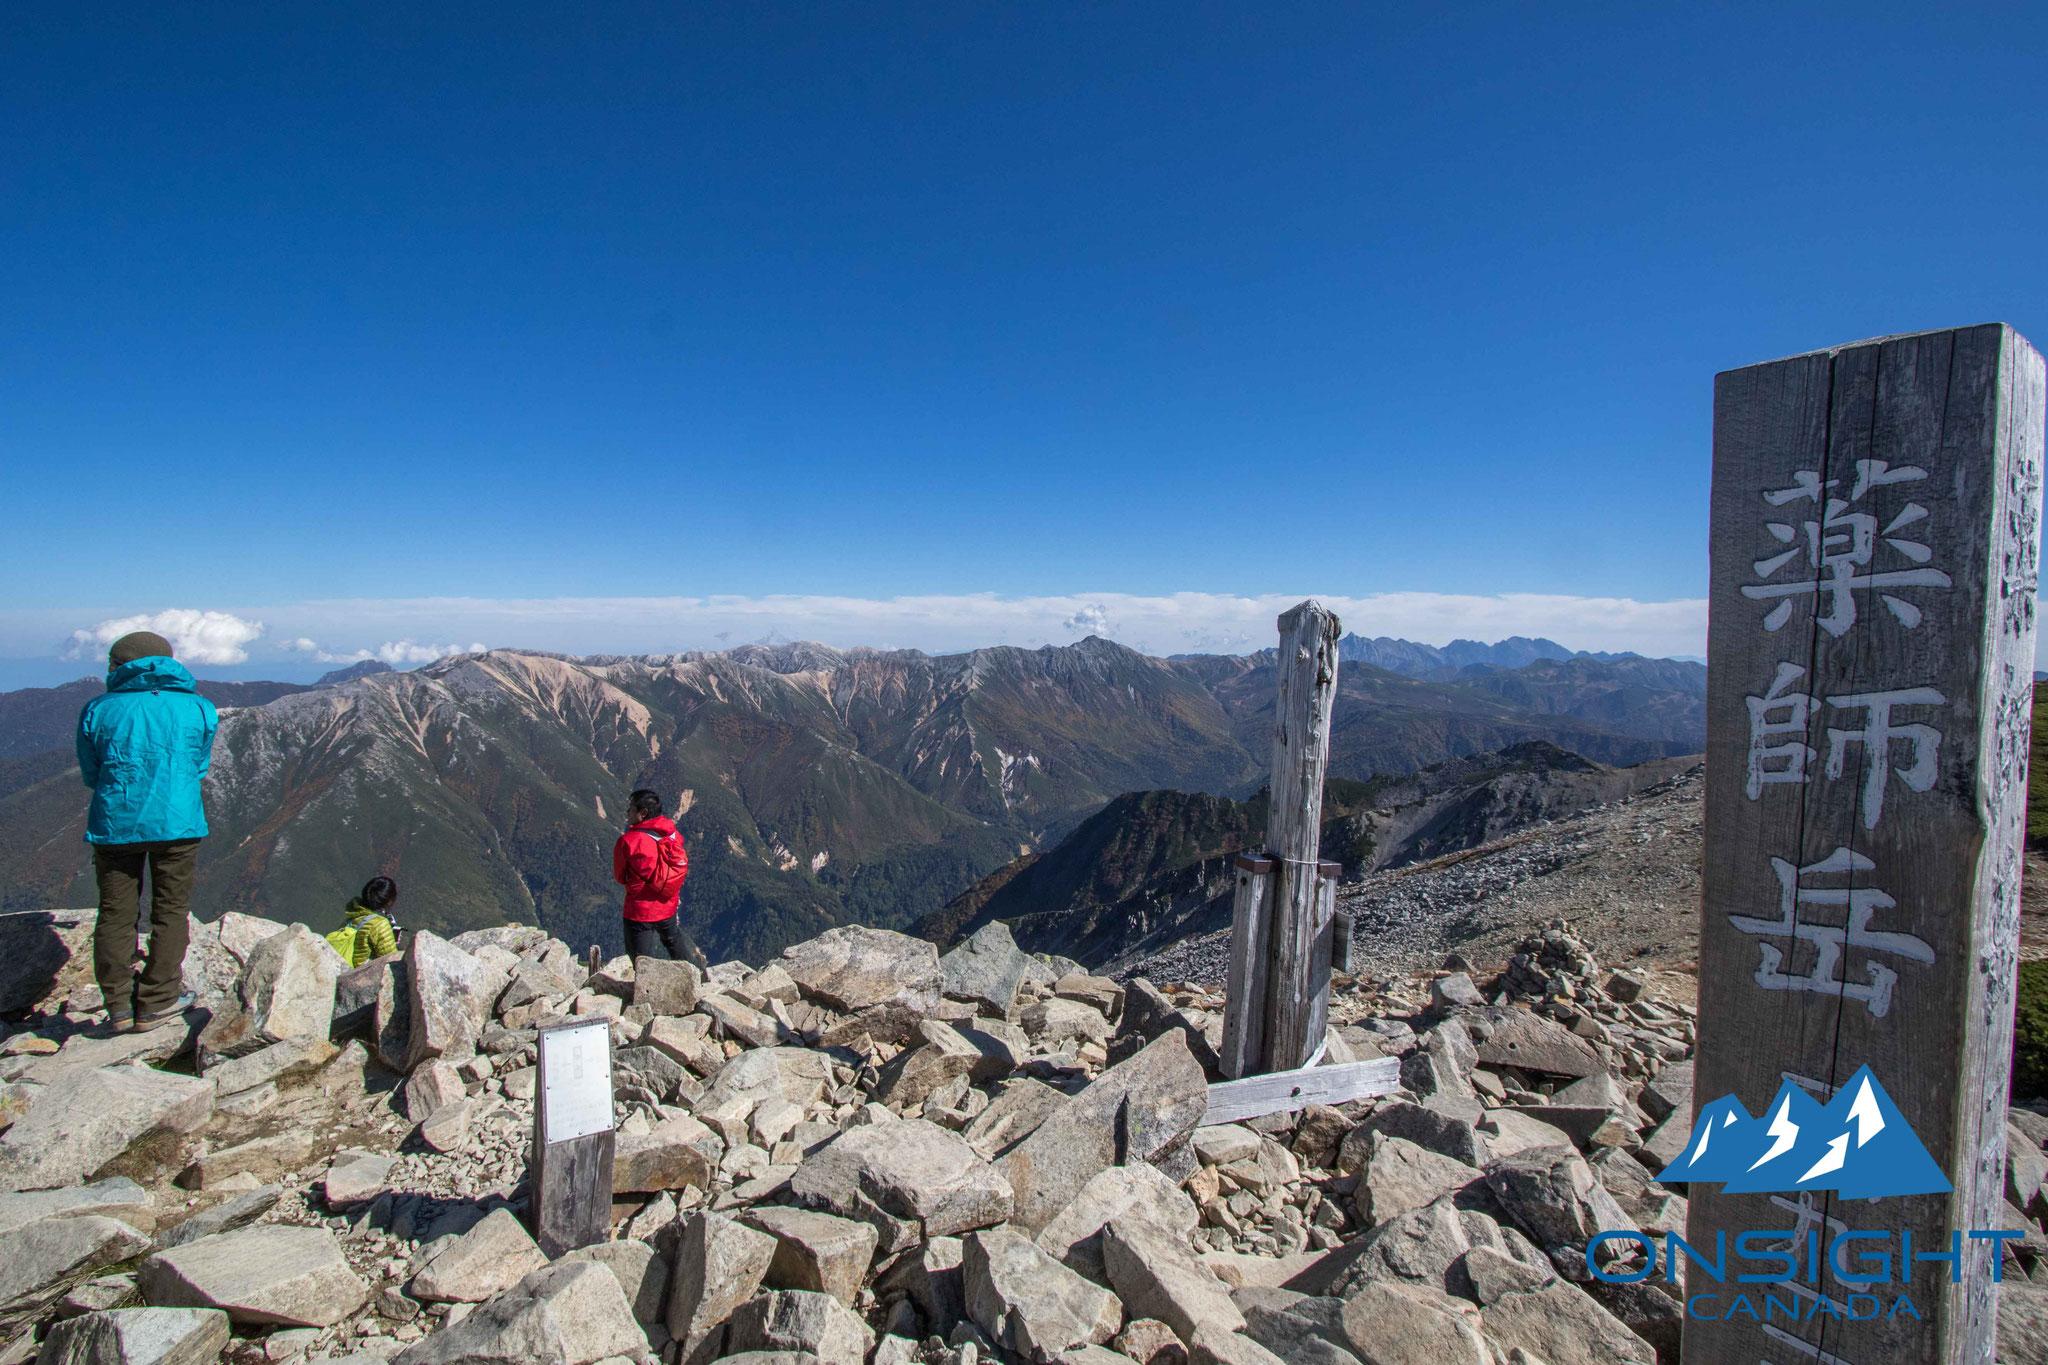 Top of Mt. Yakushi